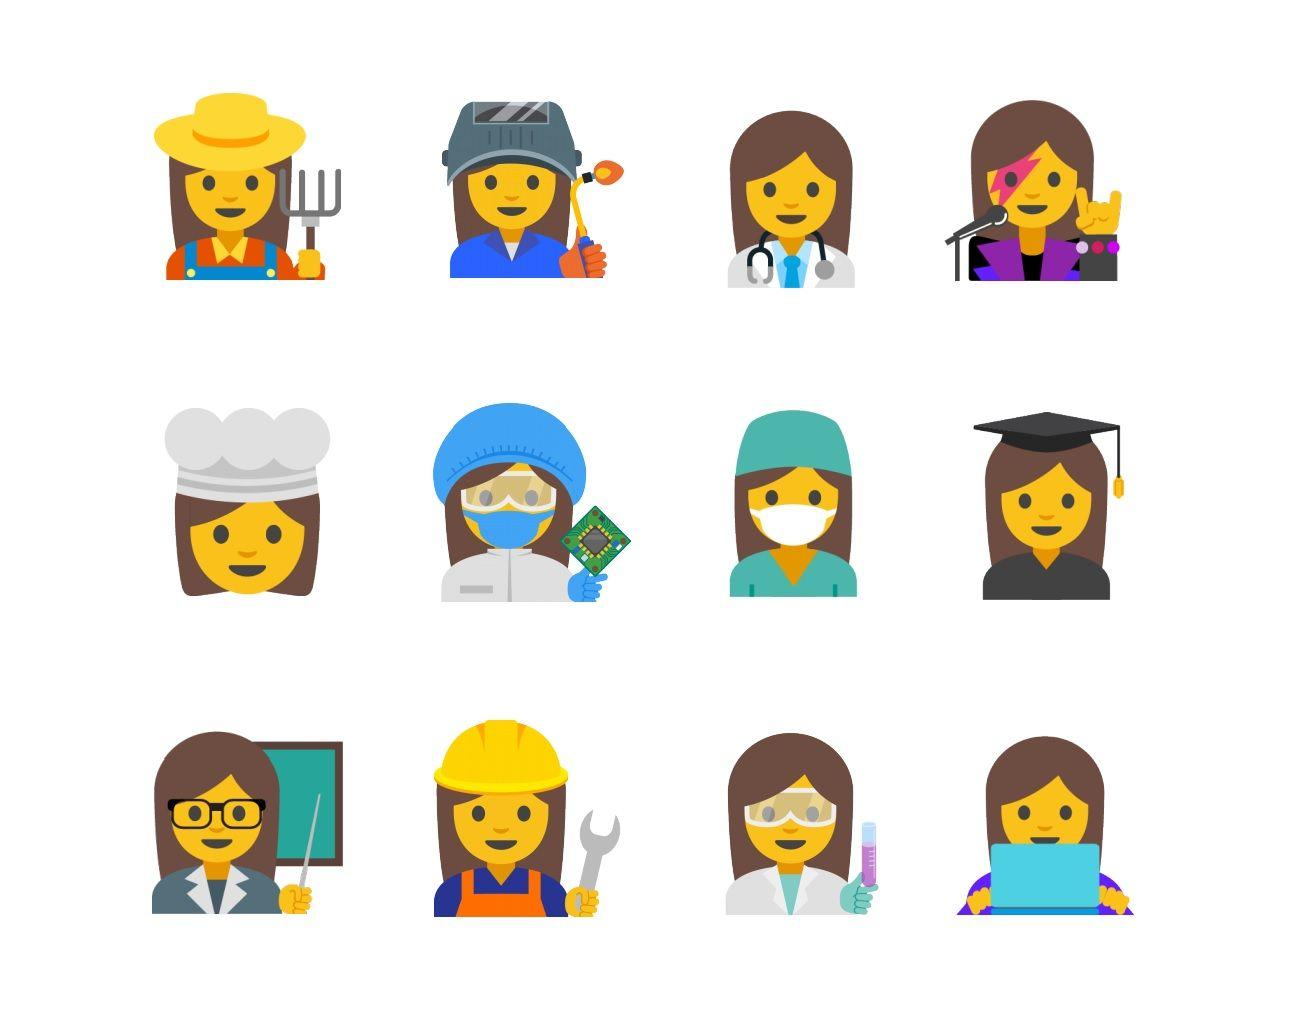 Google's proposed new female emojis